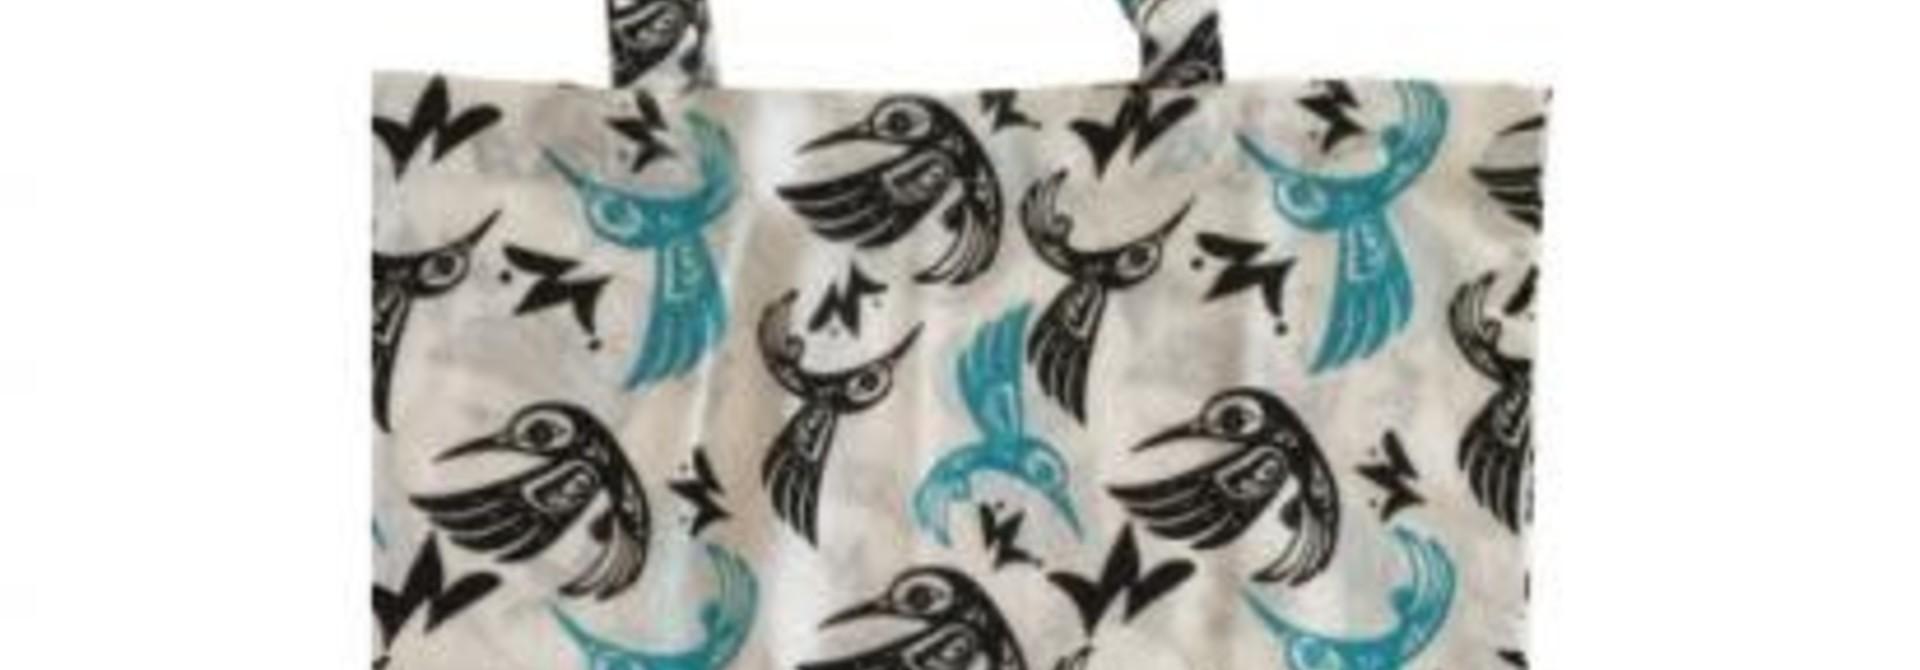 Bill Helin Hummingbird Blue Cotton Shopping Bag